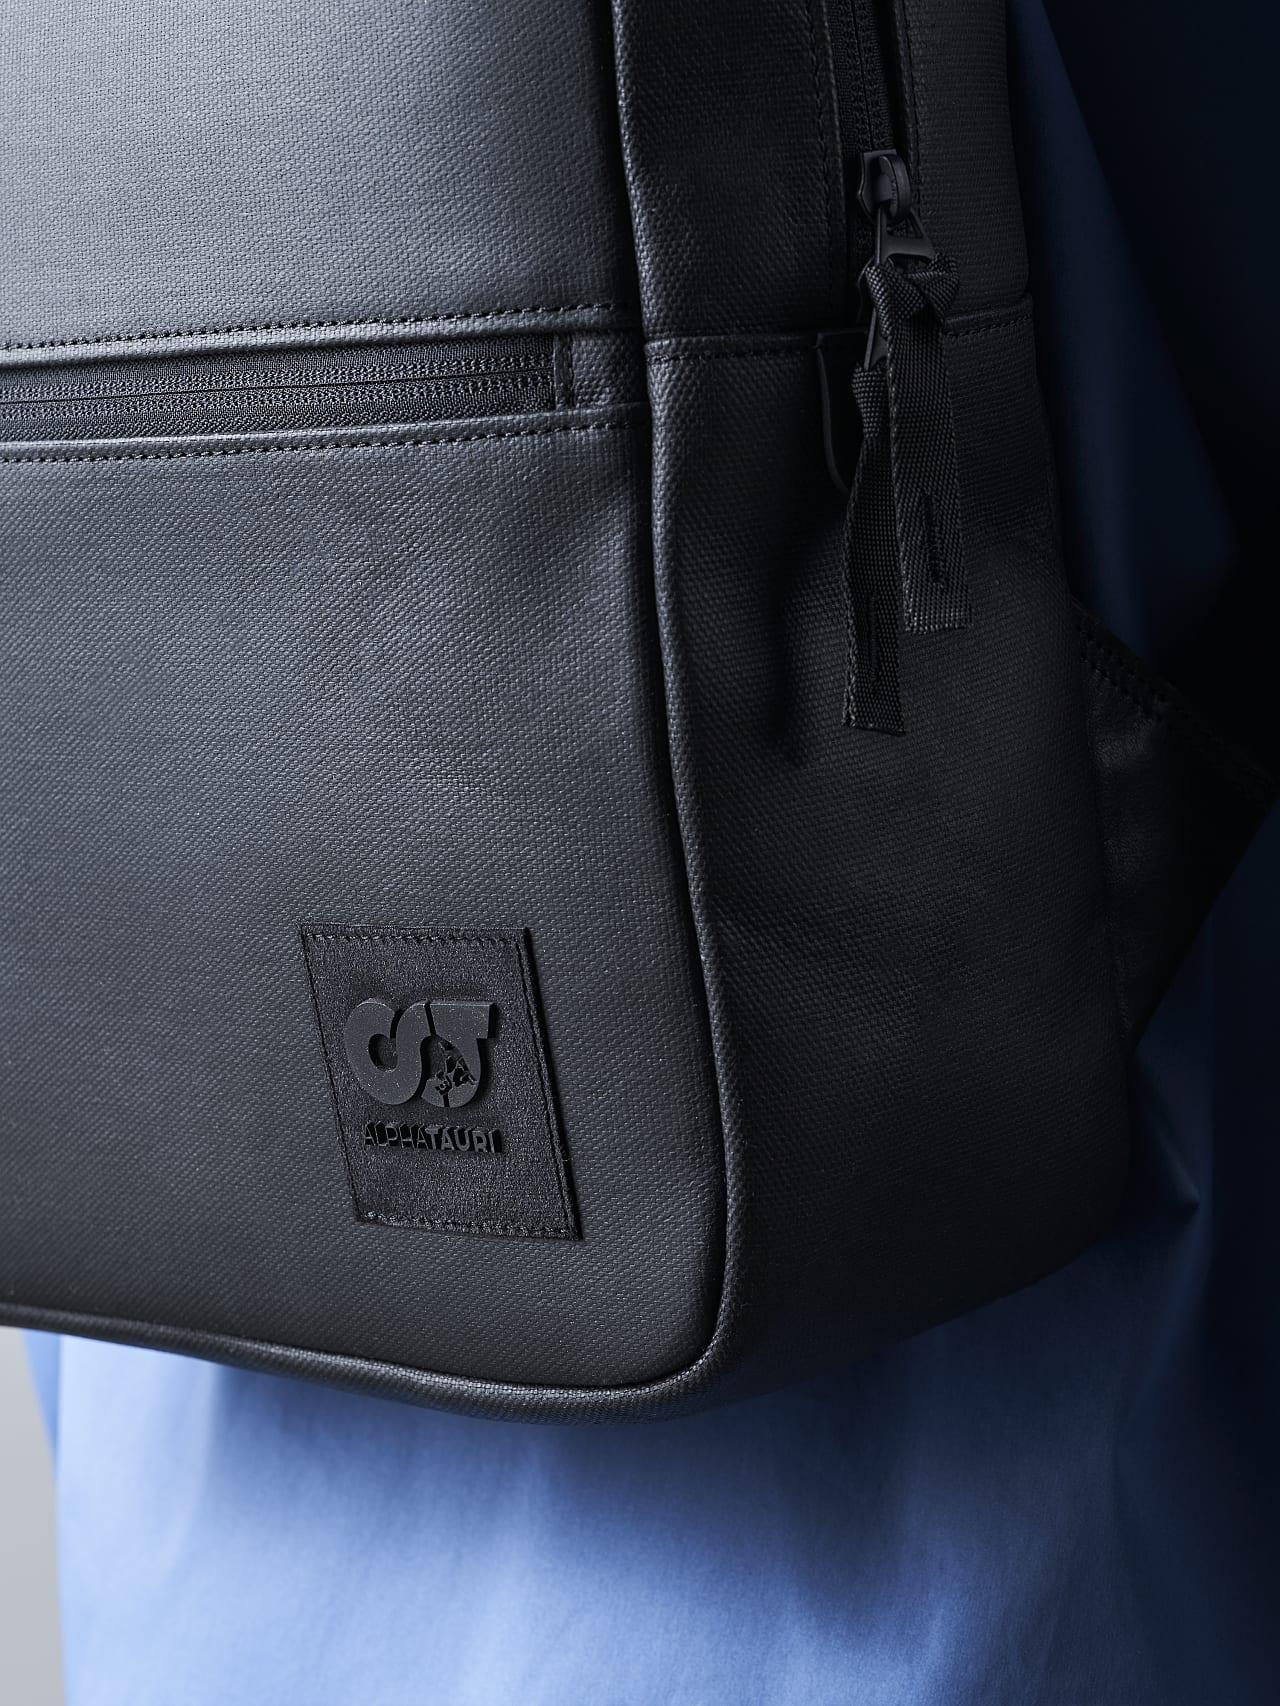 AREKK V2.Y5.02 Water-Repellent Backpack dark grey / anthracite Front Alpha Tauri